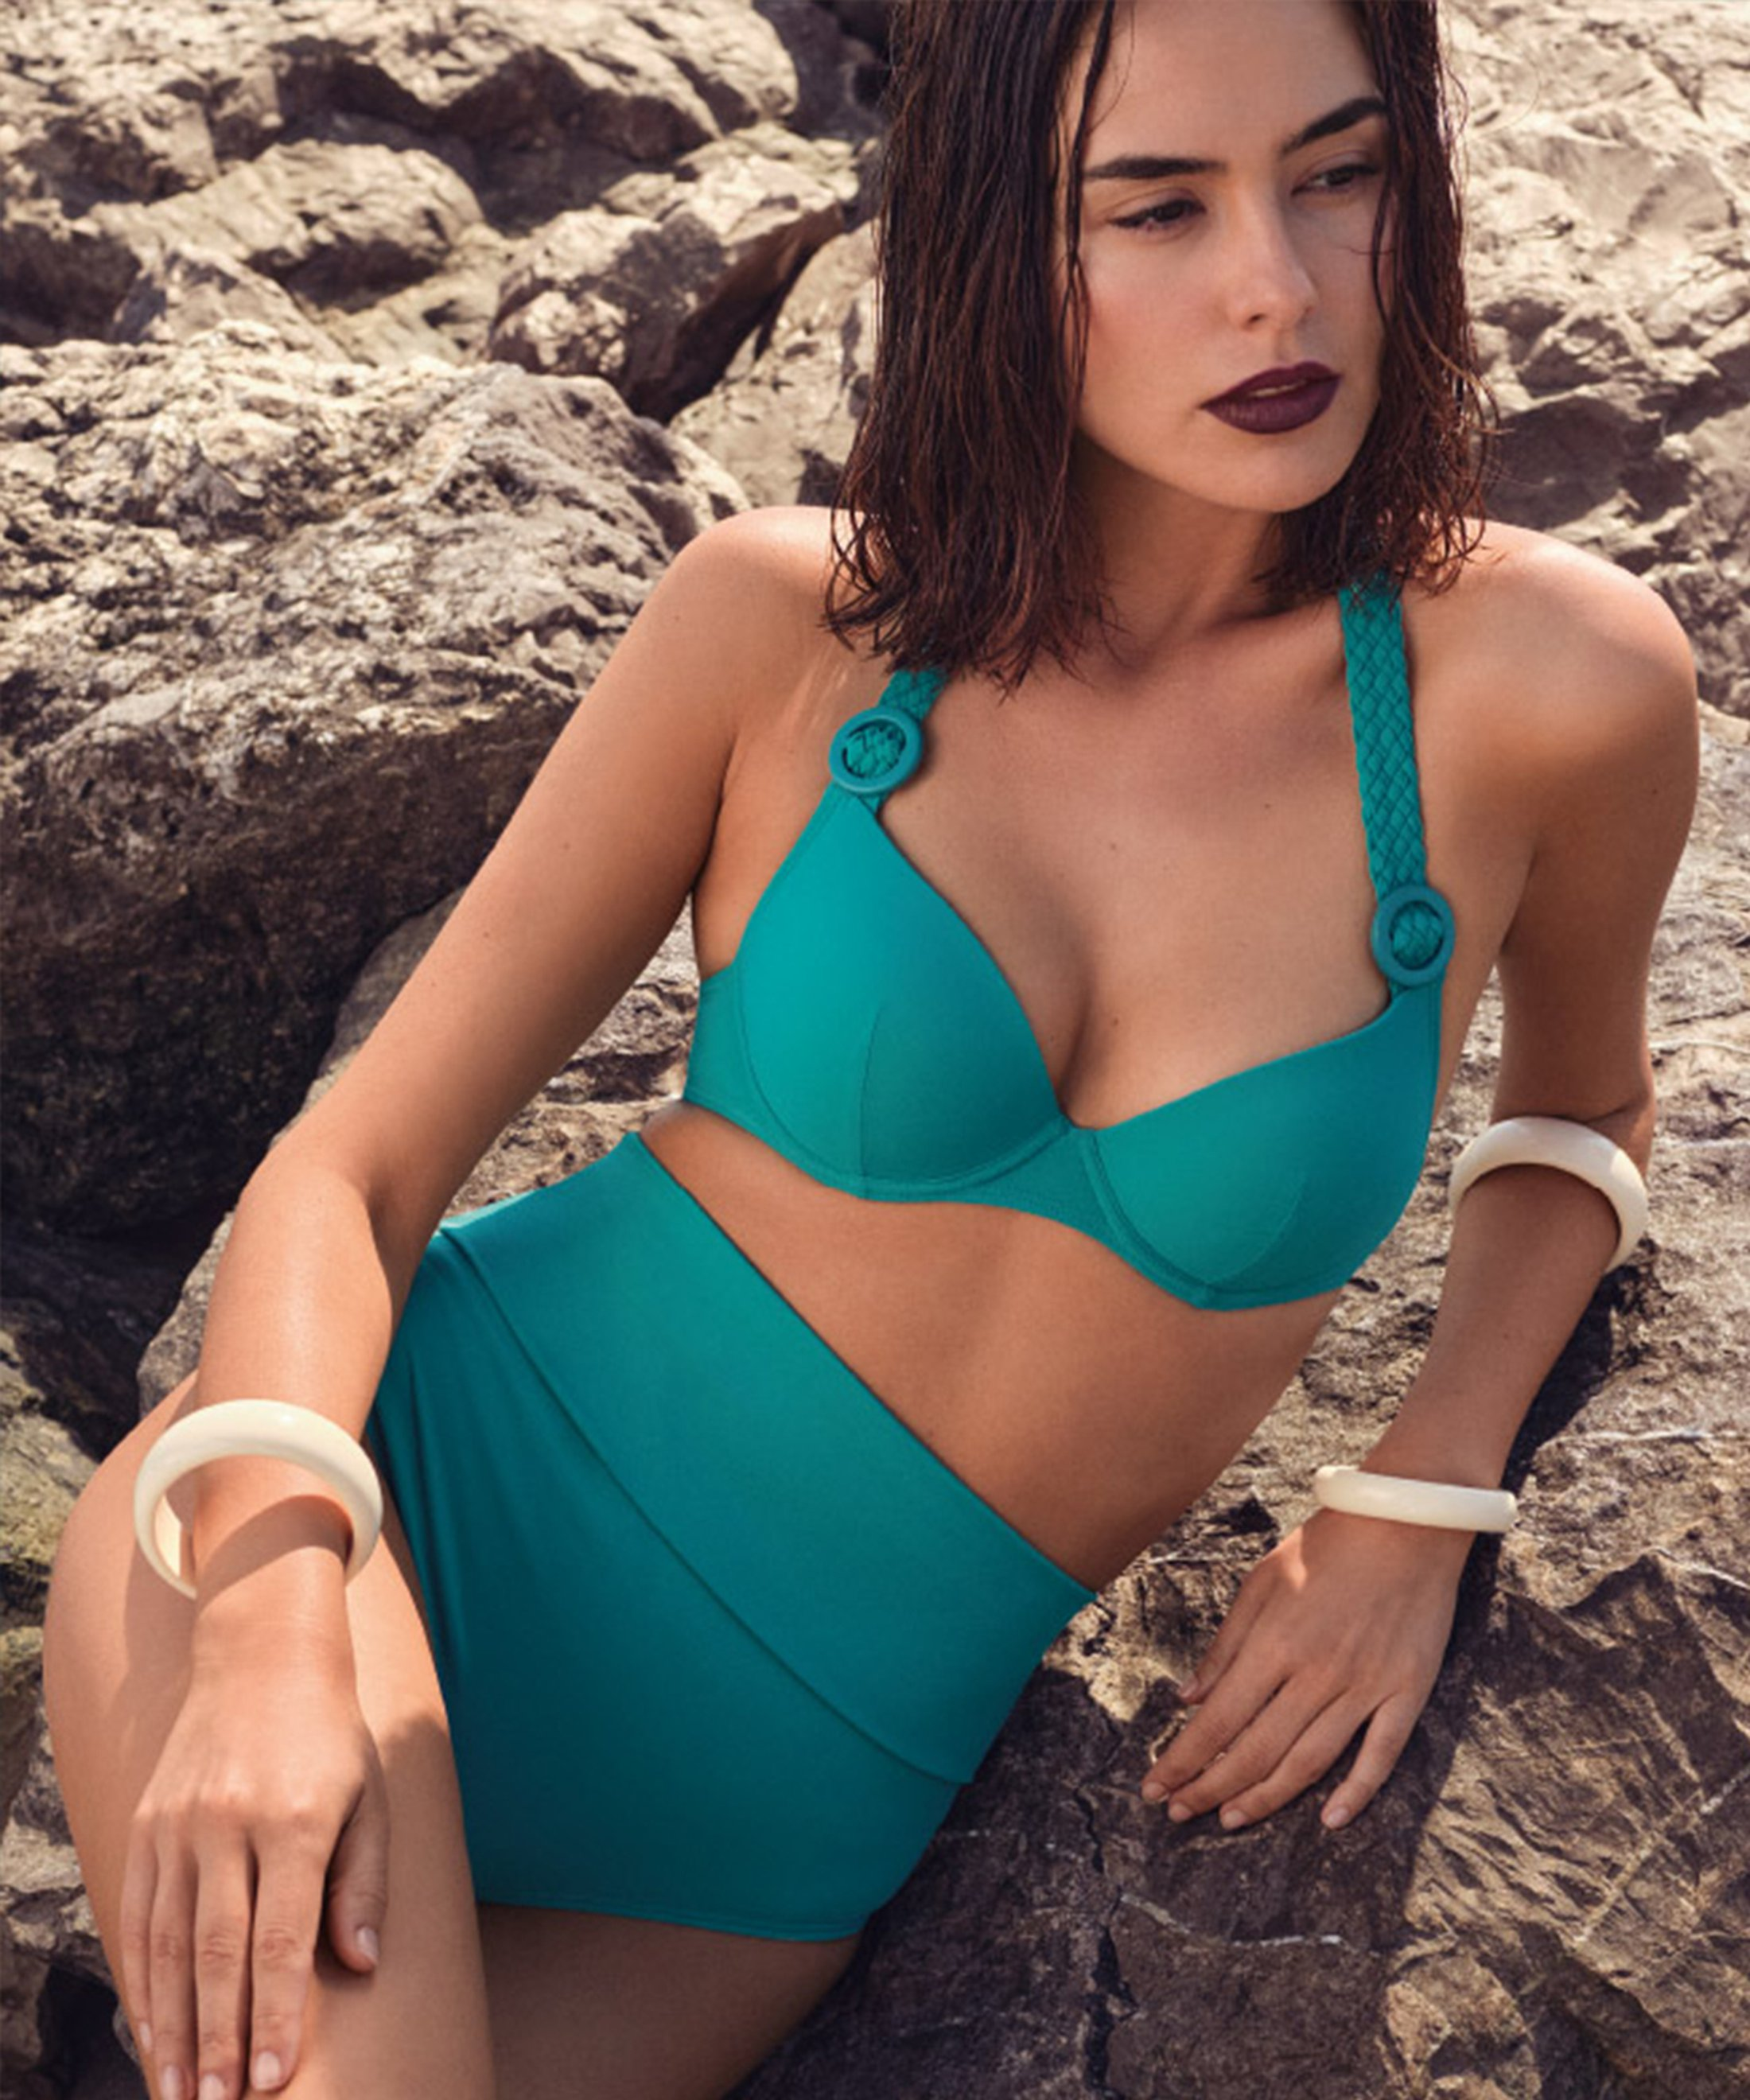 LA PLAGE ENSOLEILLÉE Moulded push-up bikini top Mineral Green | Aubade